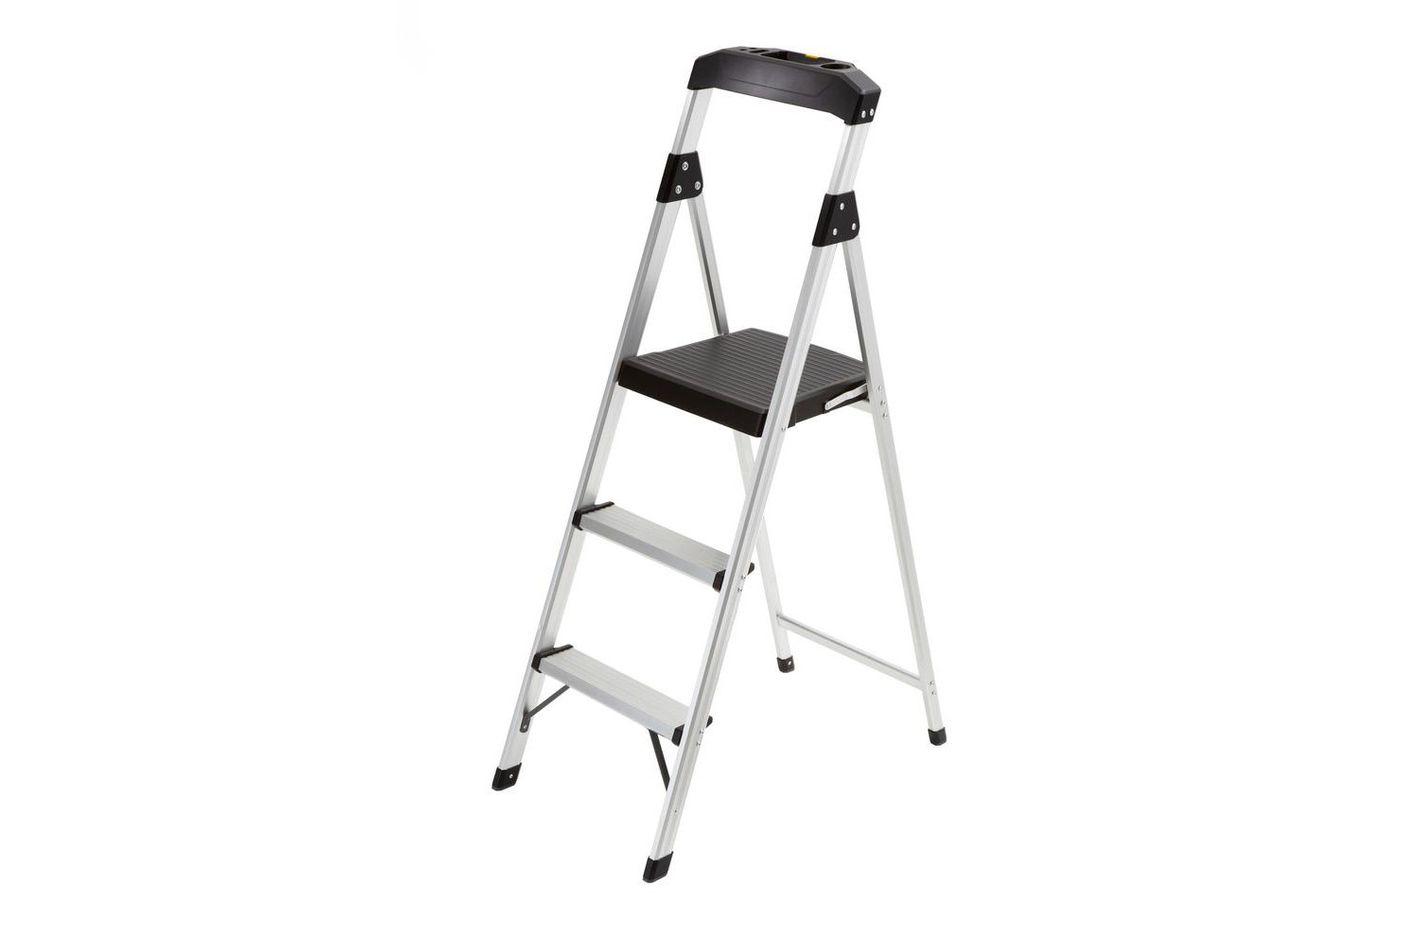 Gorilla Ladders 3-Step Aluminum Step Stool Ladder